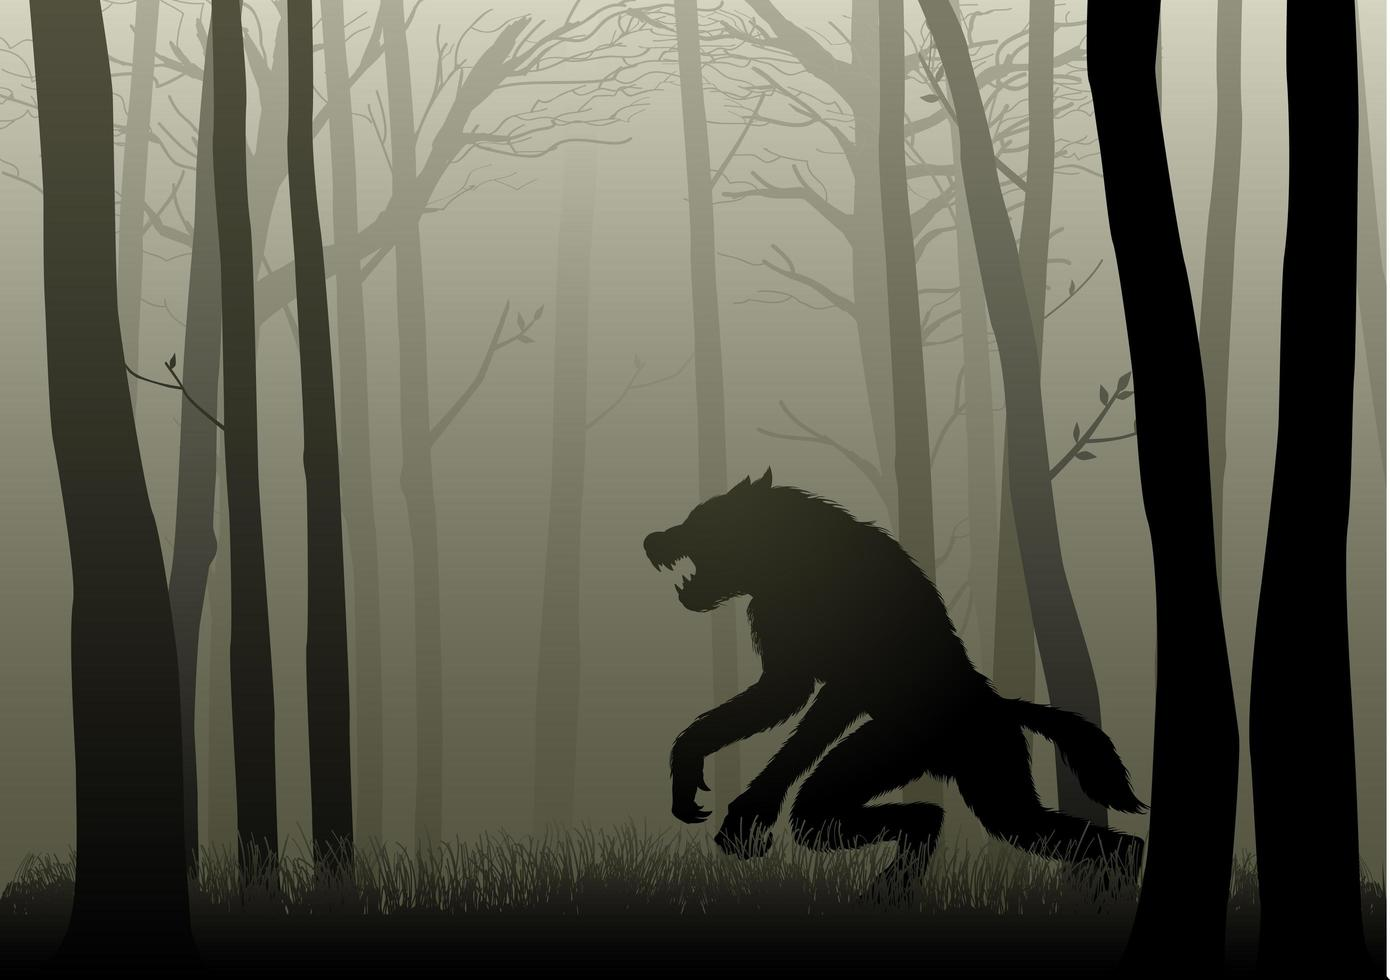 lobisomem na floresta escura vetor